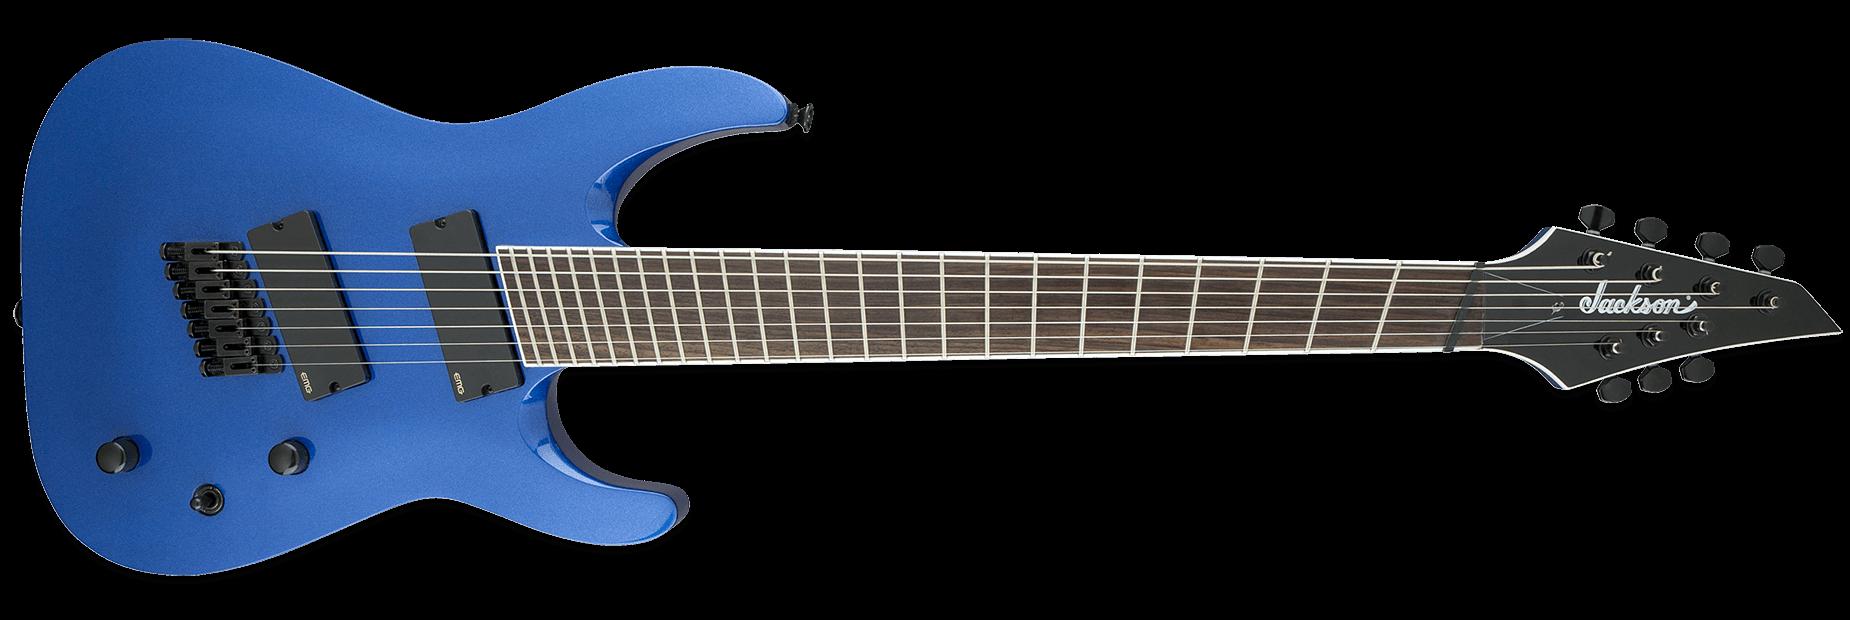 Jackson X Series Soloist Archtop SLAT7 MS Metallic Blue